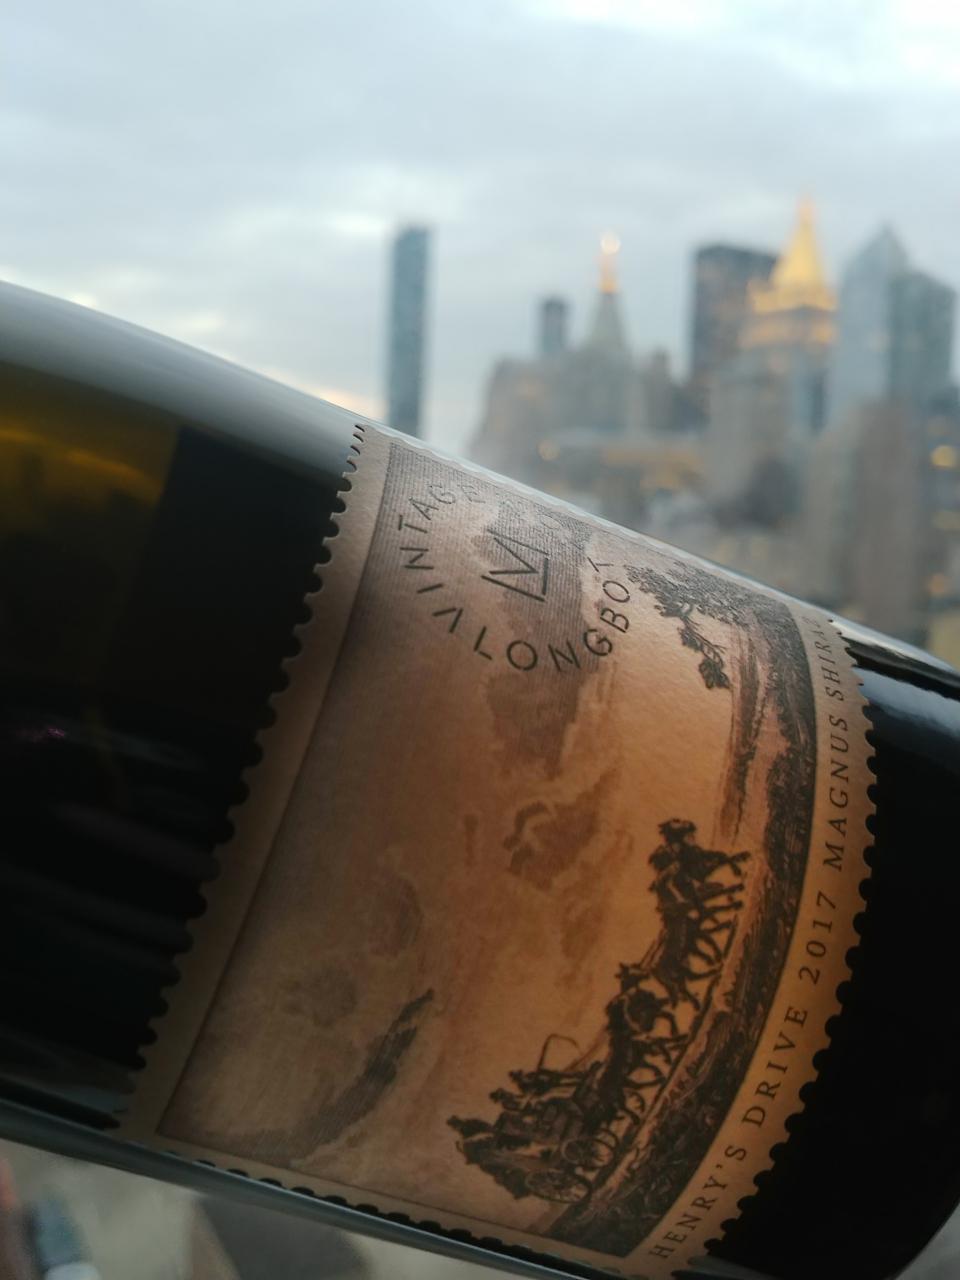 2017 Henry's Drive Magnus Shiraz by Vintage Longbottom